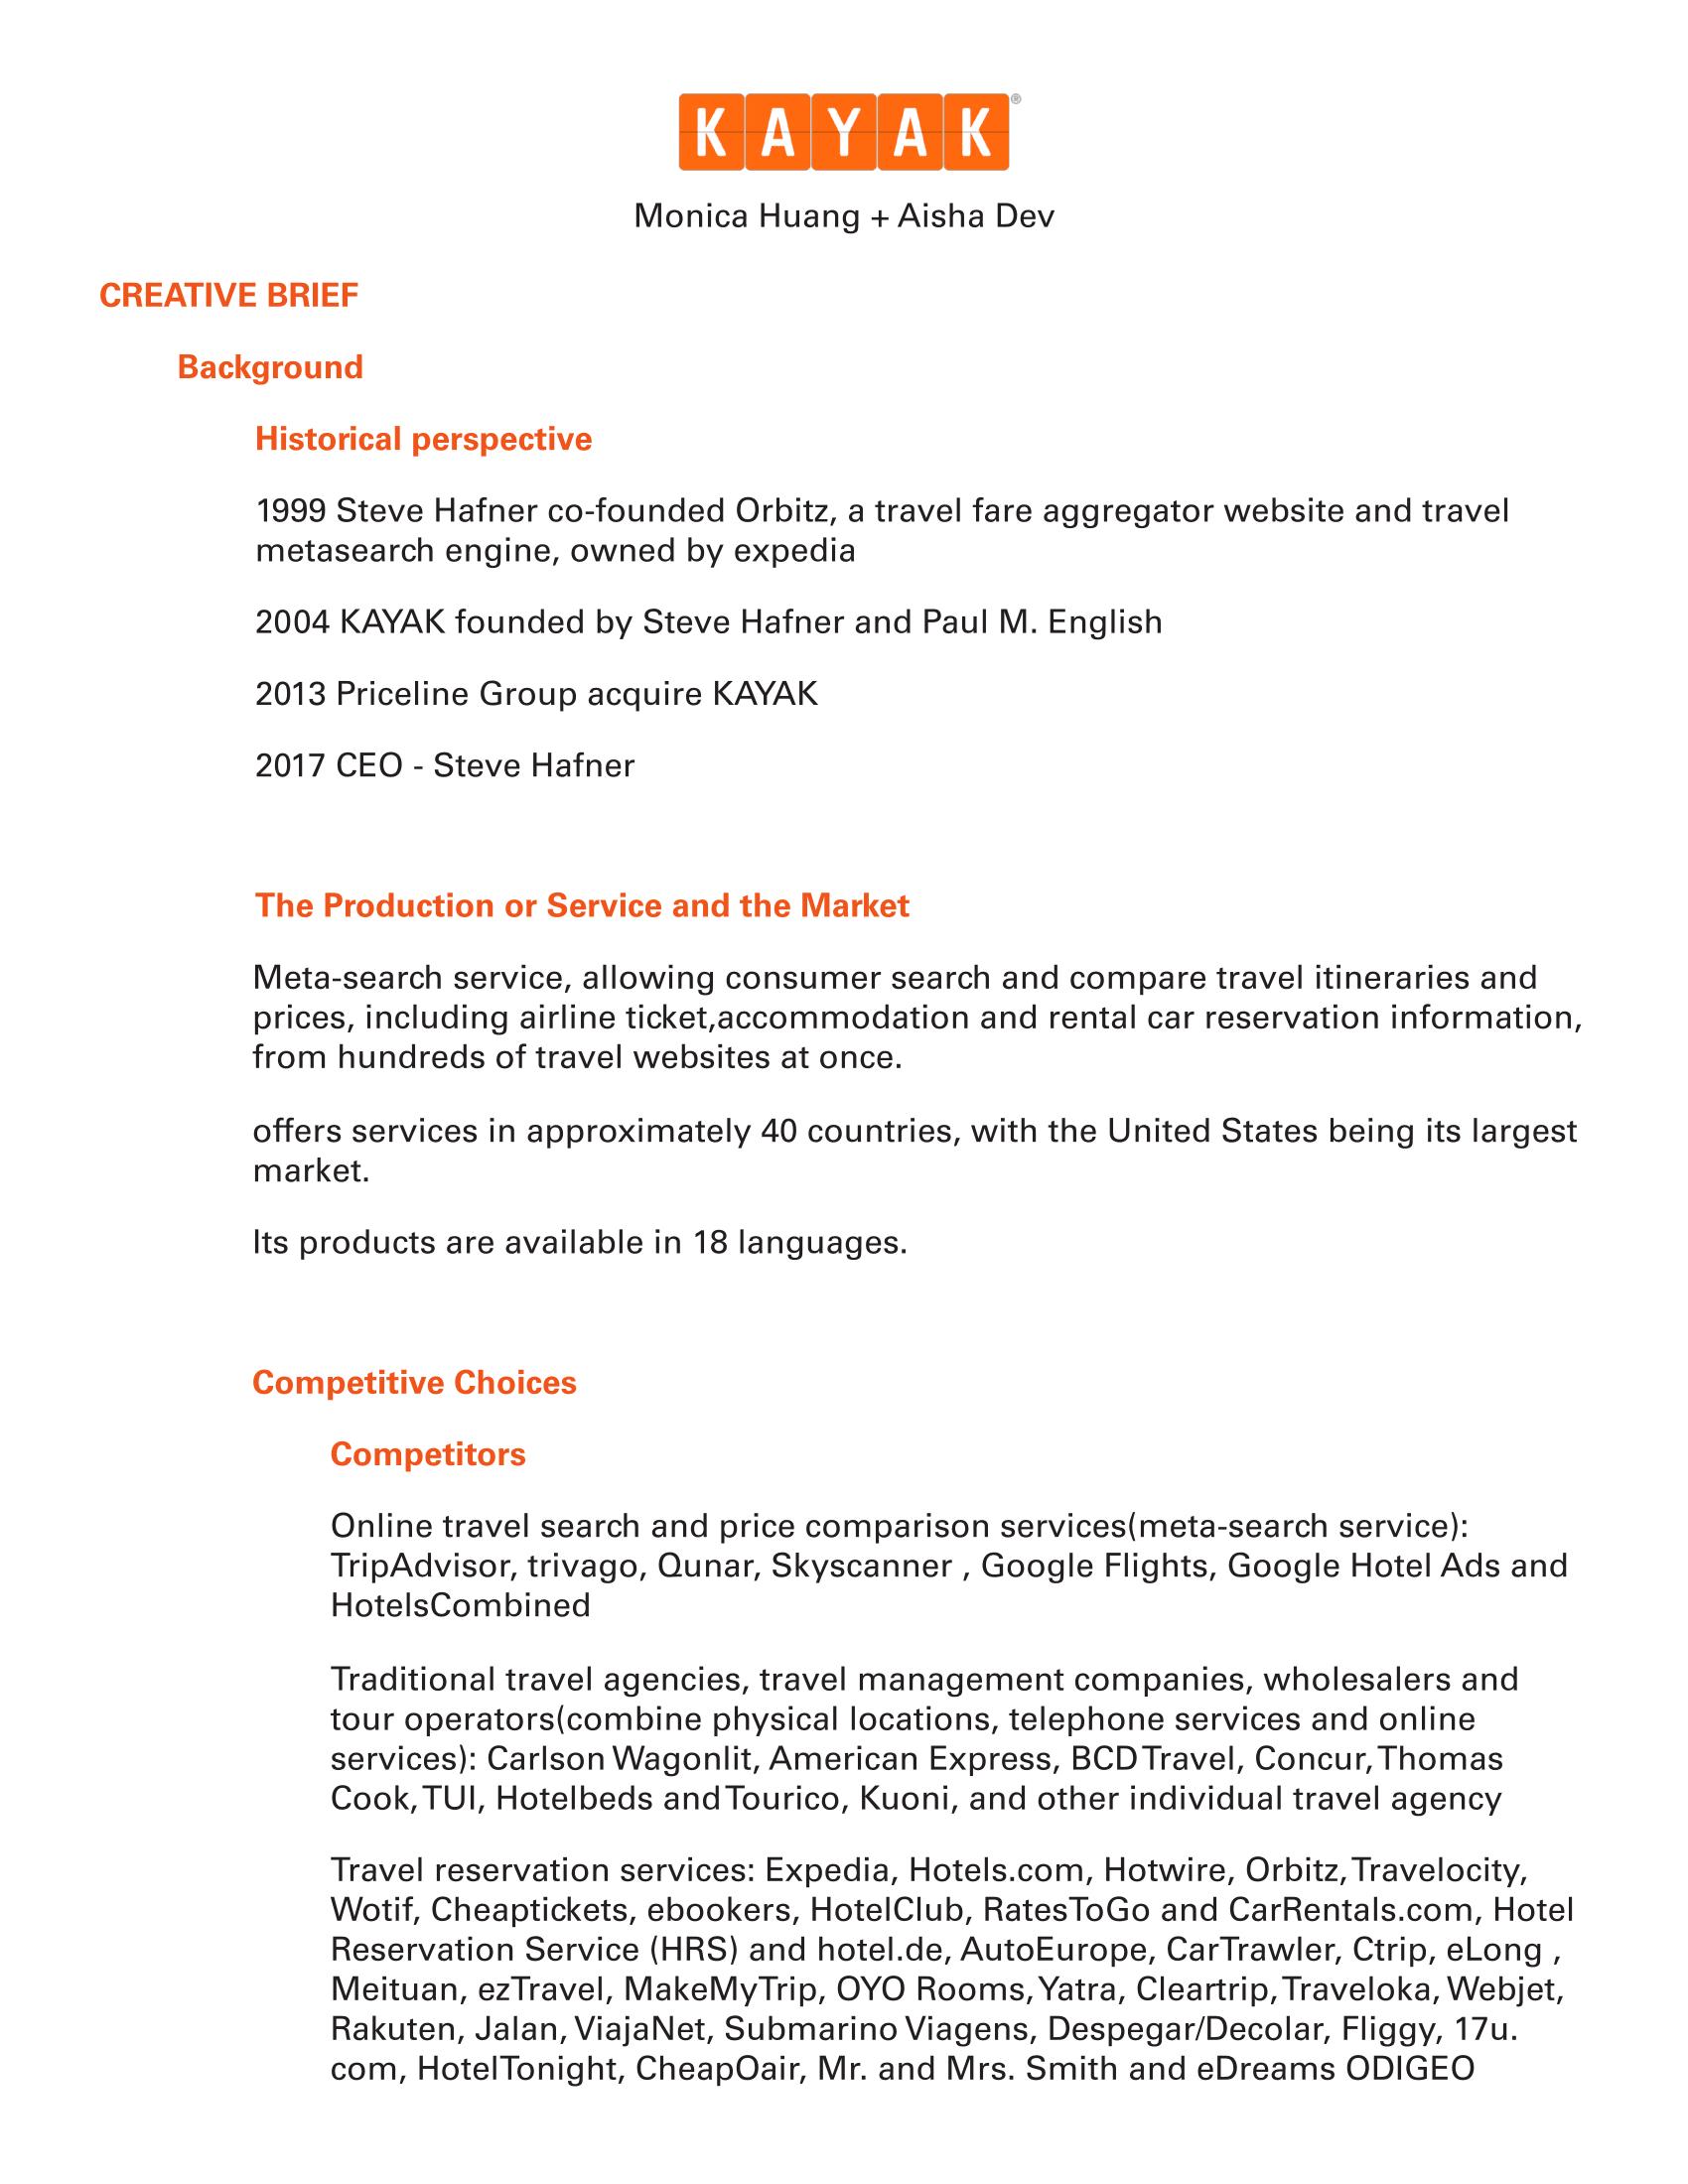 KAYAK_CreativeBrief copy 2-1.png